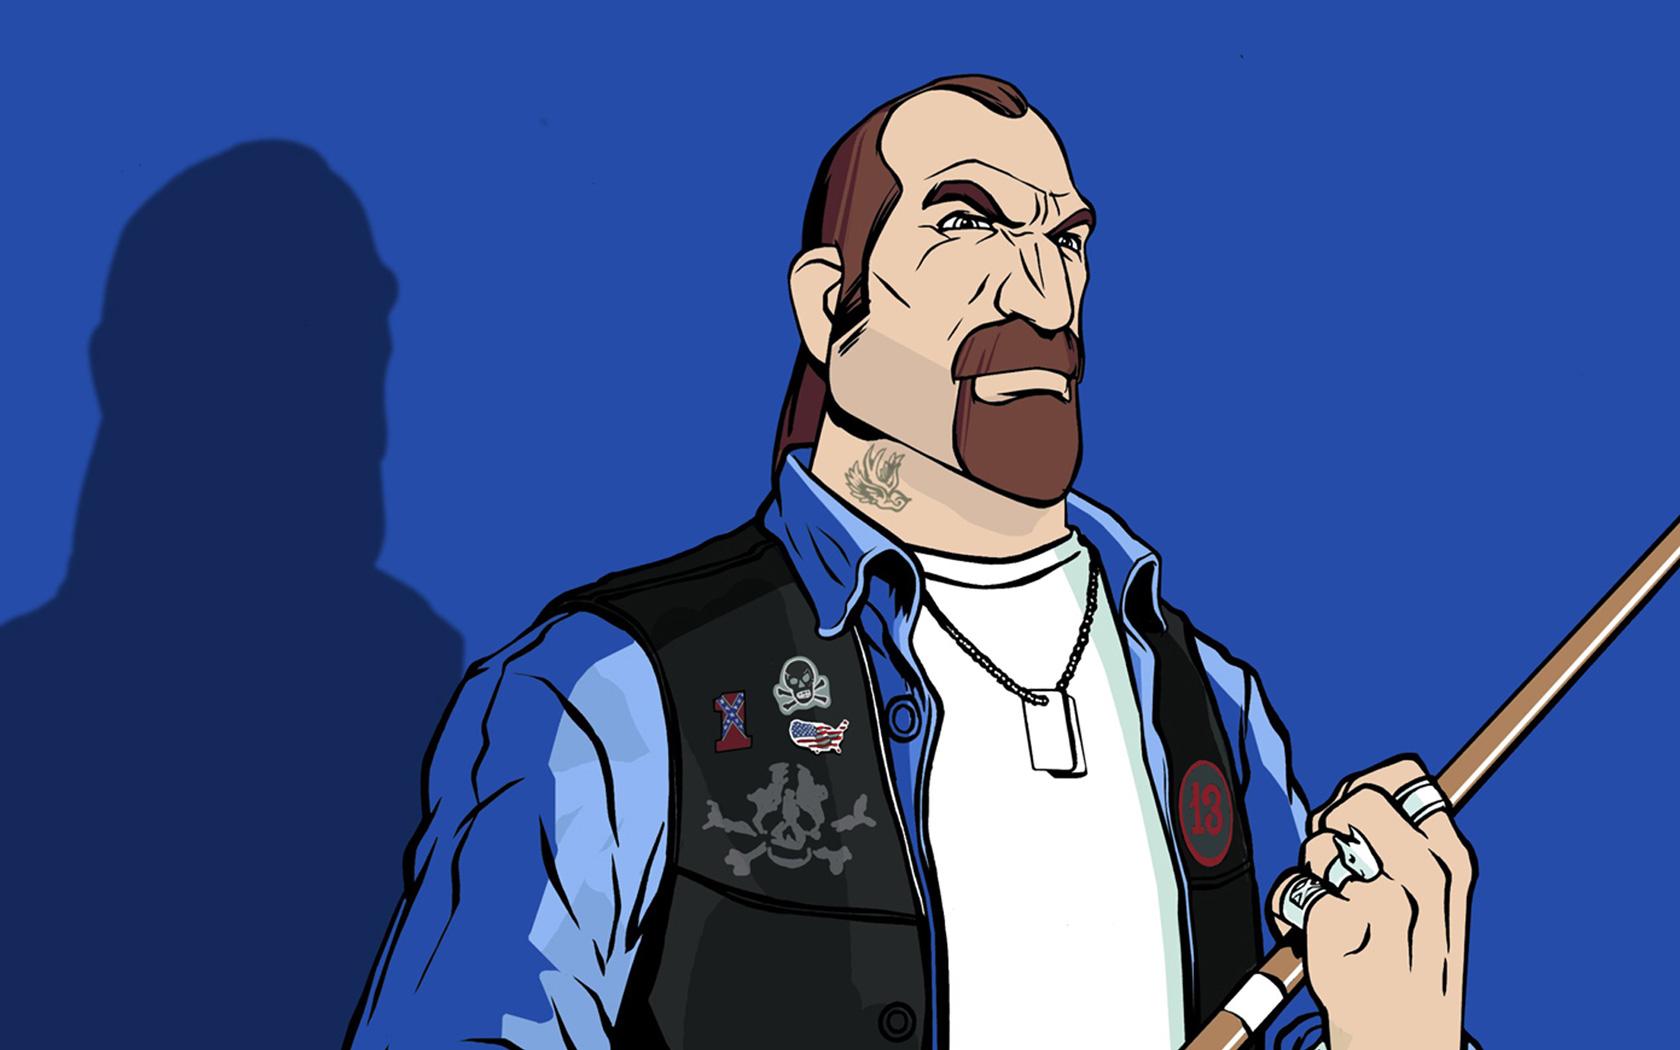 Free Grand Theft Auto: Vice City Wallpaper in 1680x1050